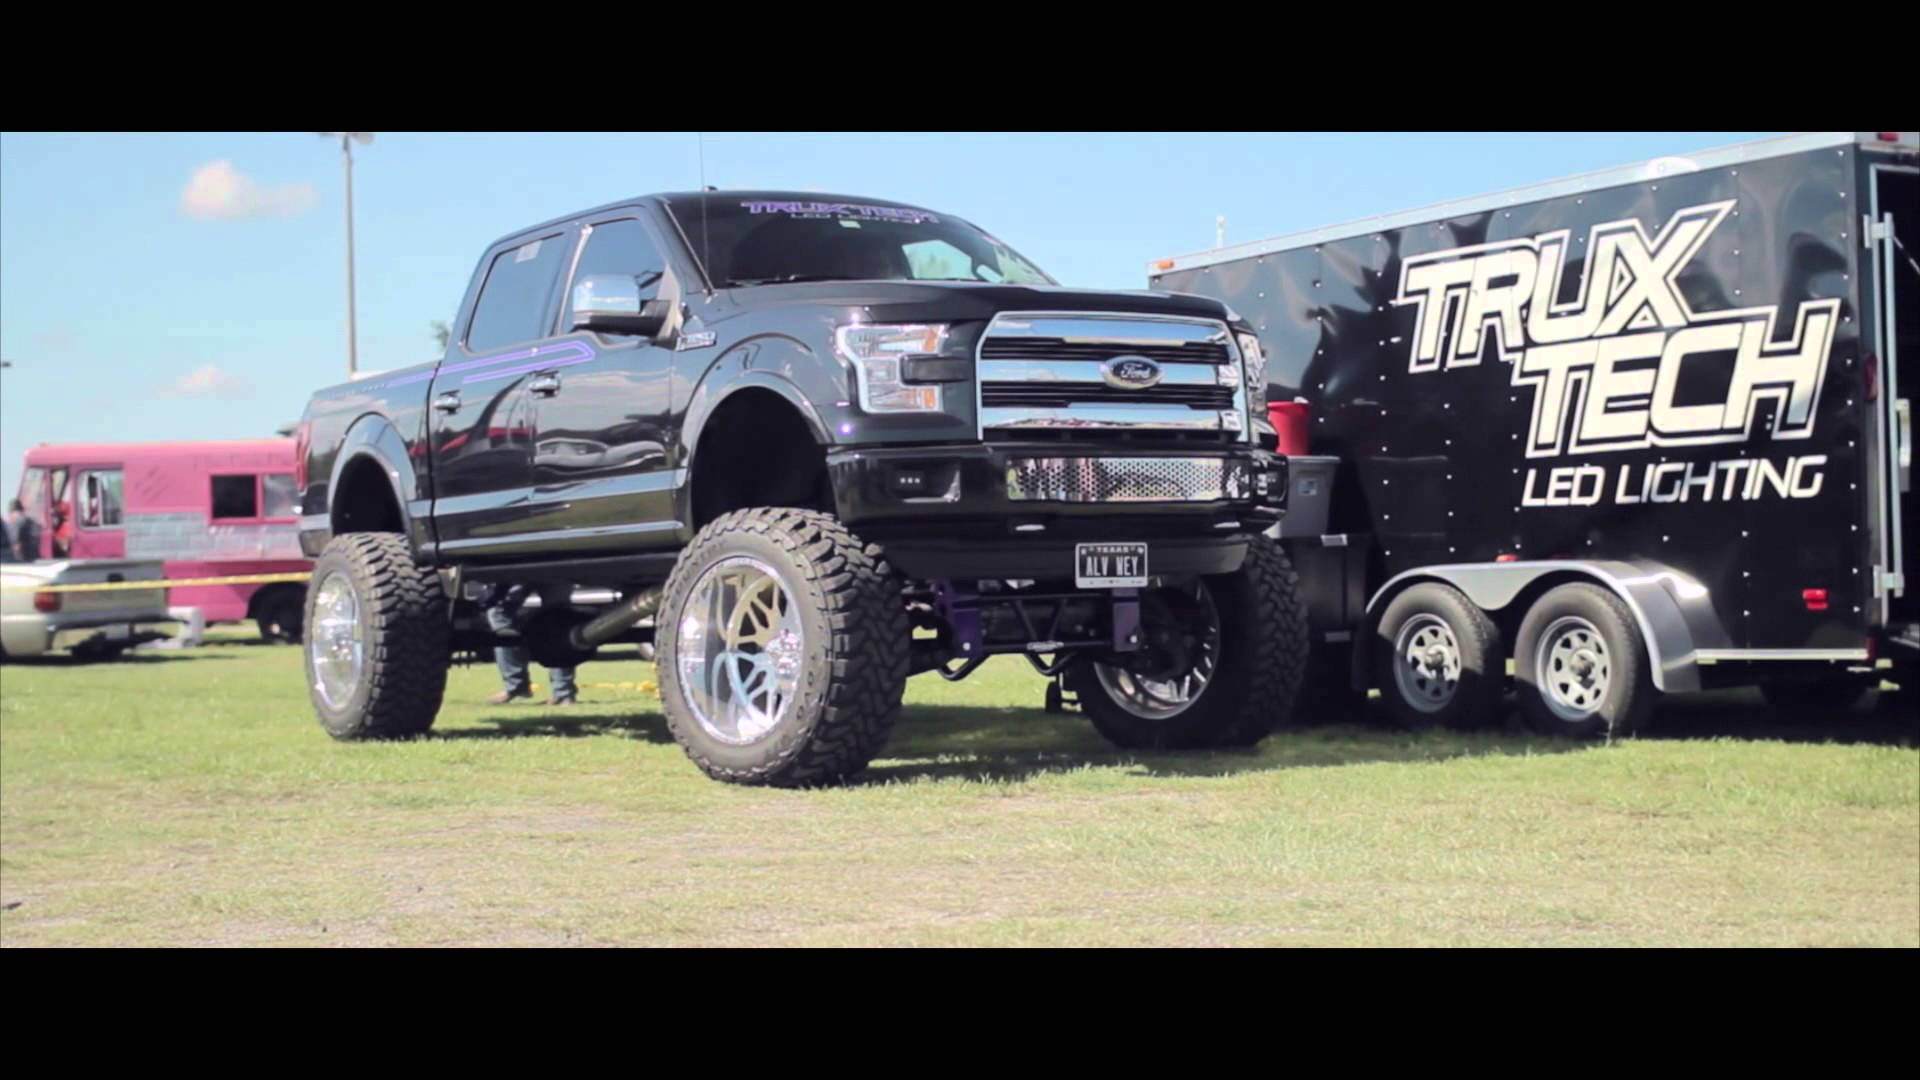 Suelo Truck Show 2015 - YouTube